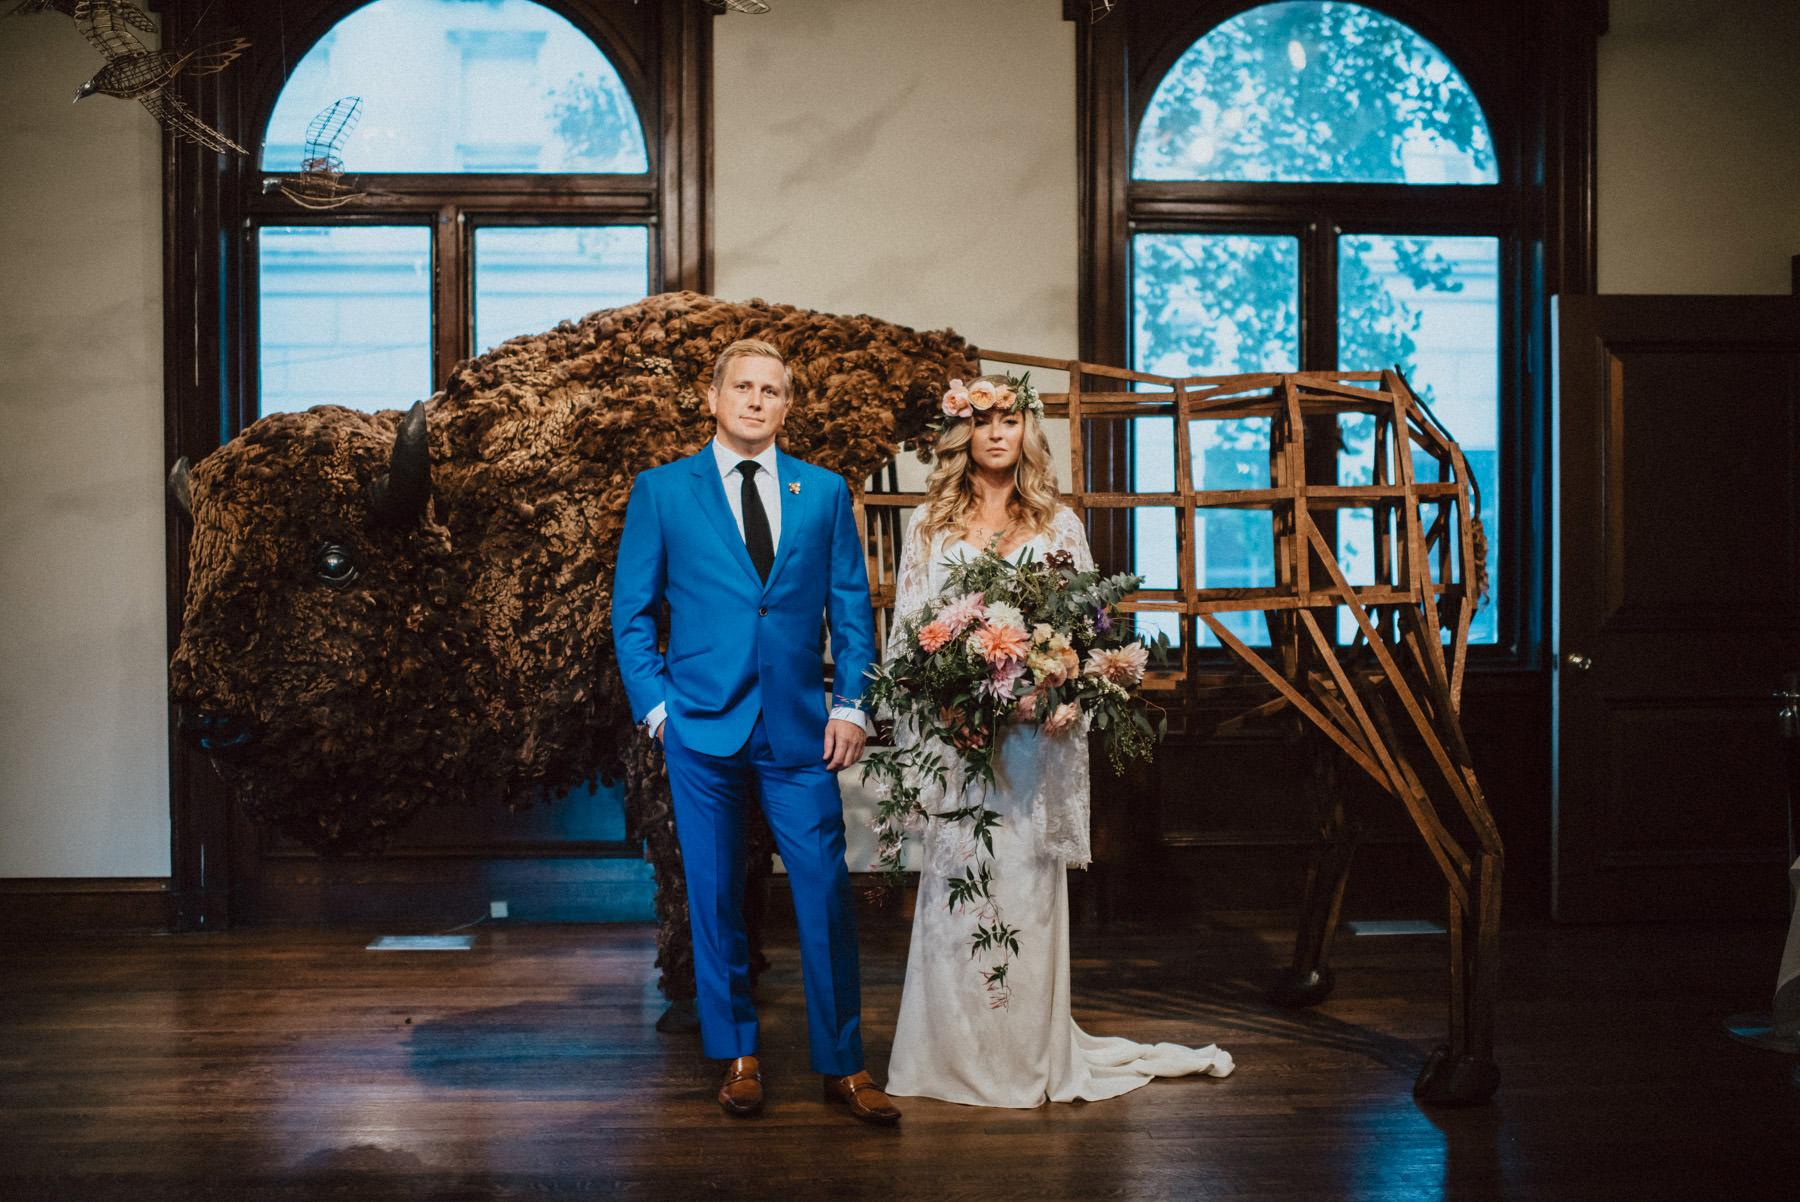 224-la-cherie-philly-wedding-2.jpg